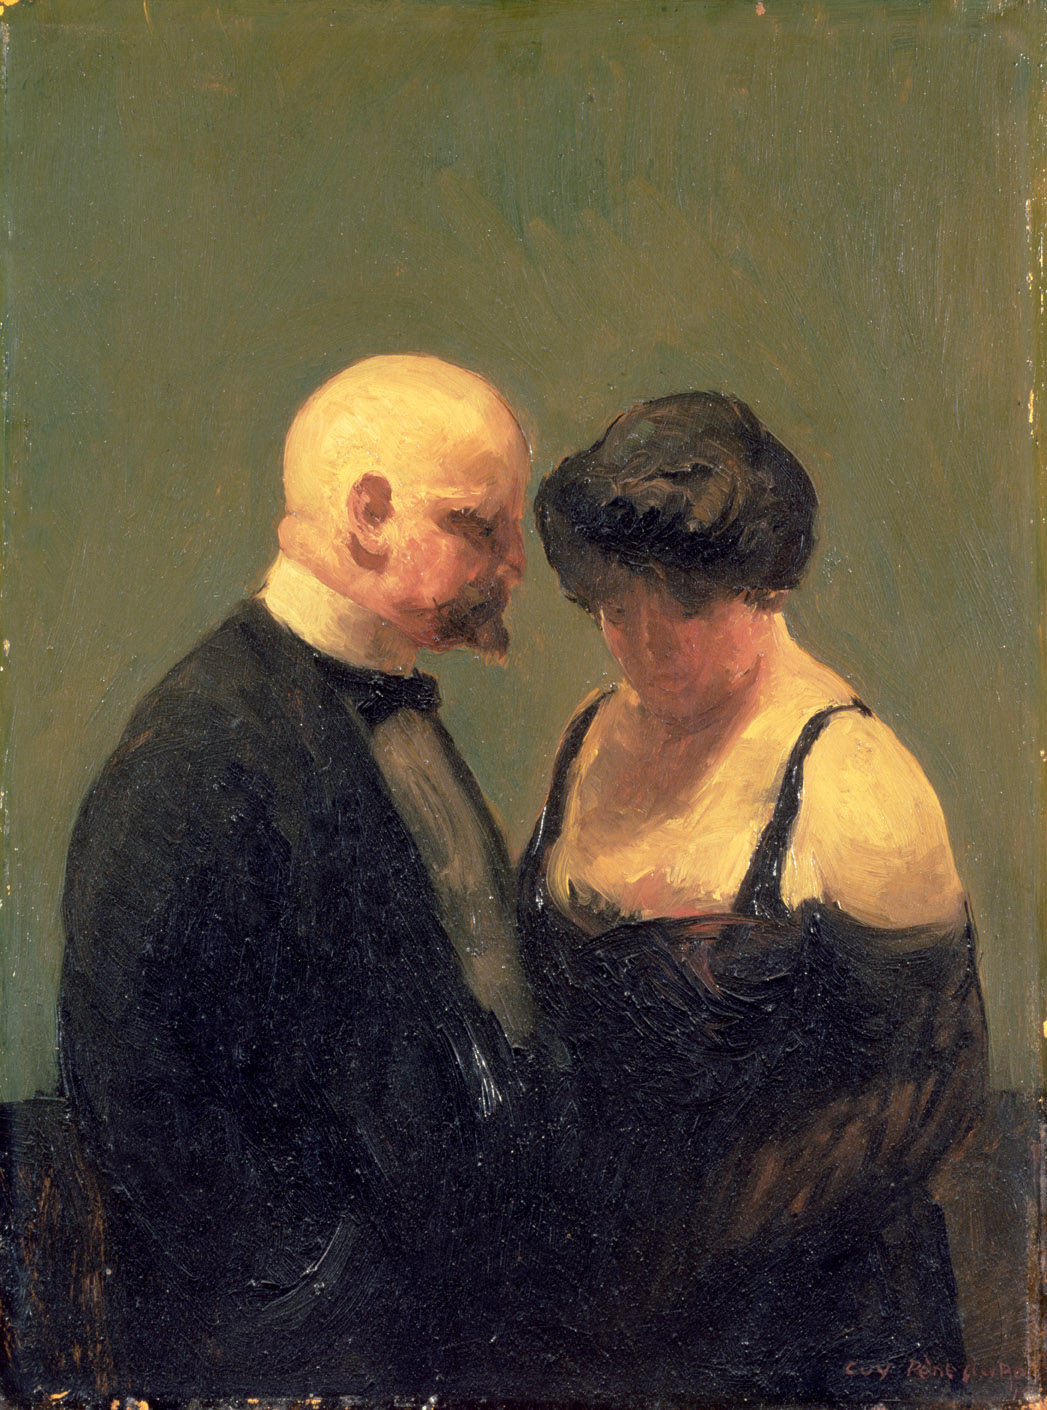 The Confidence Man, by Guy Pène du Bois, 1919. Brooklyn Museum of Art, New York.